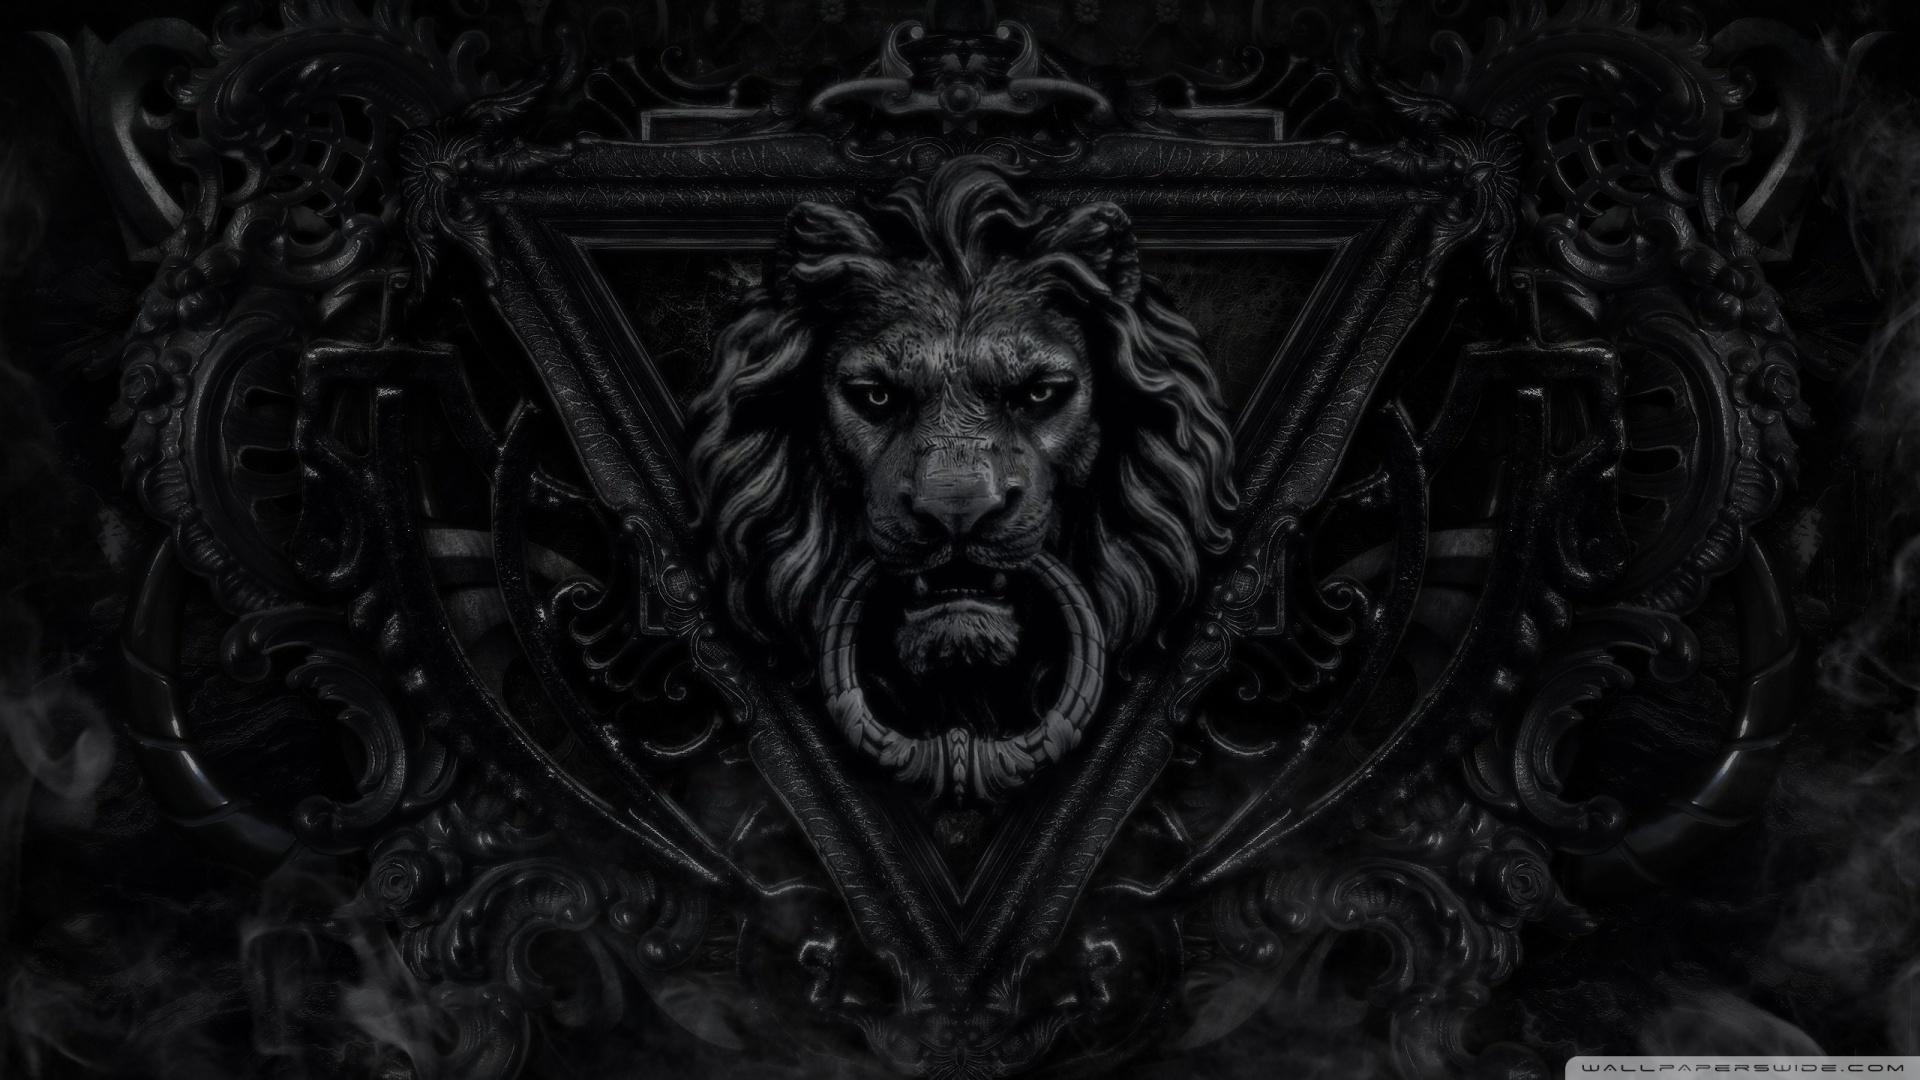 Hd wallpaper lion - Hd 16 9